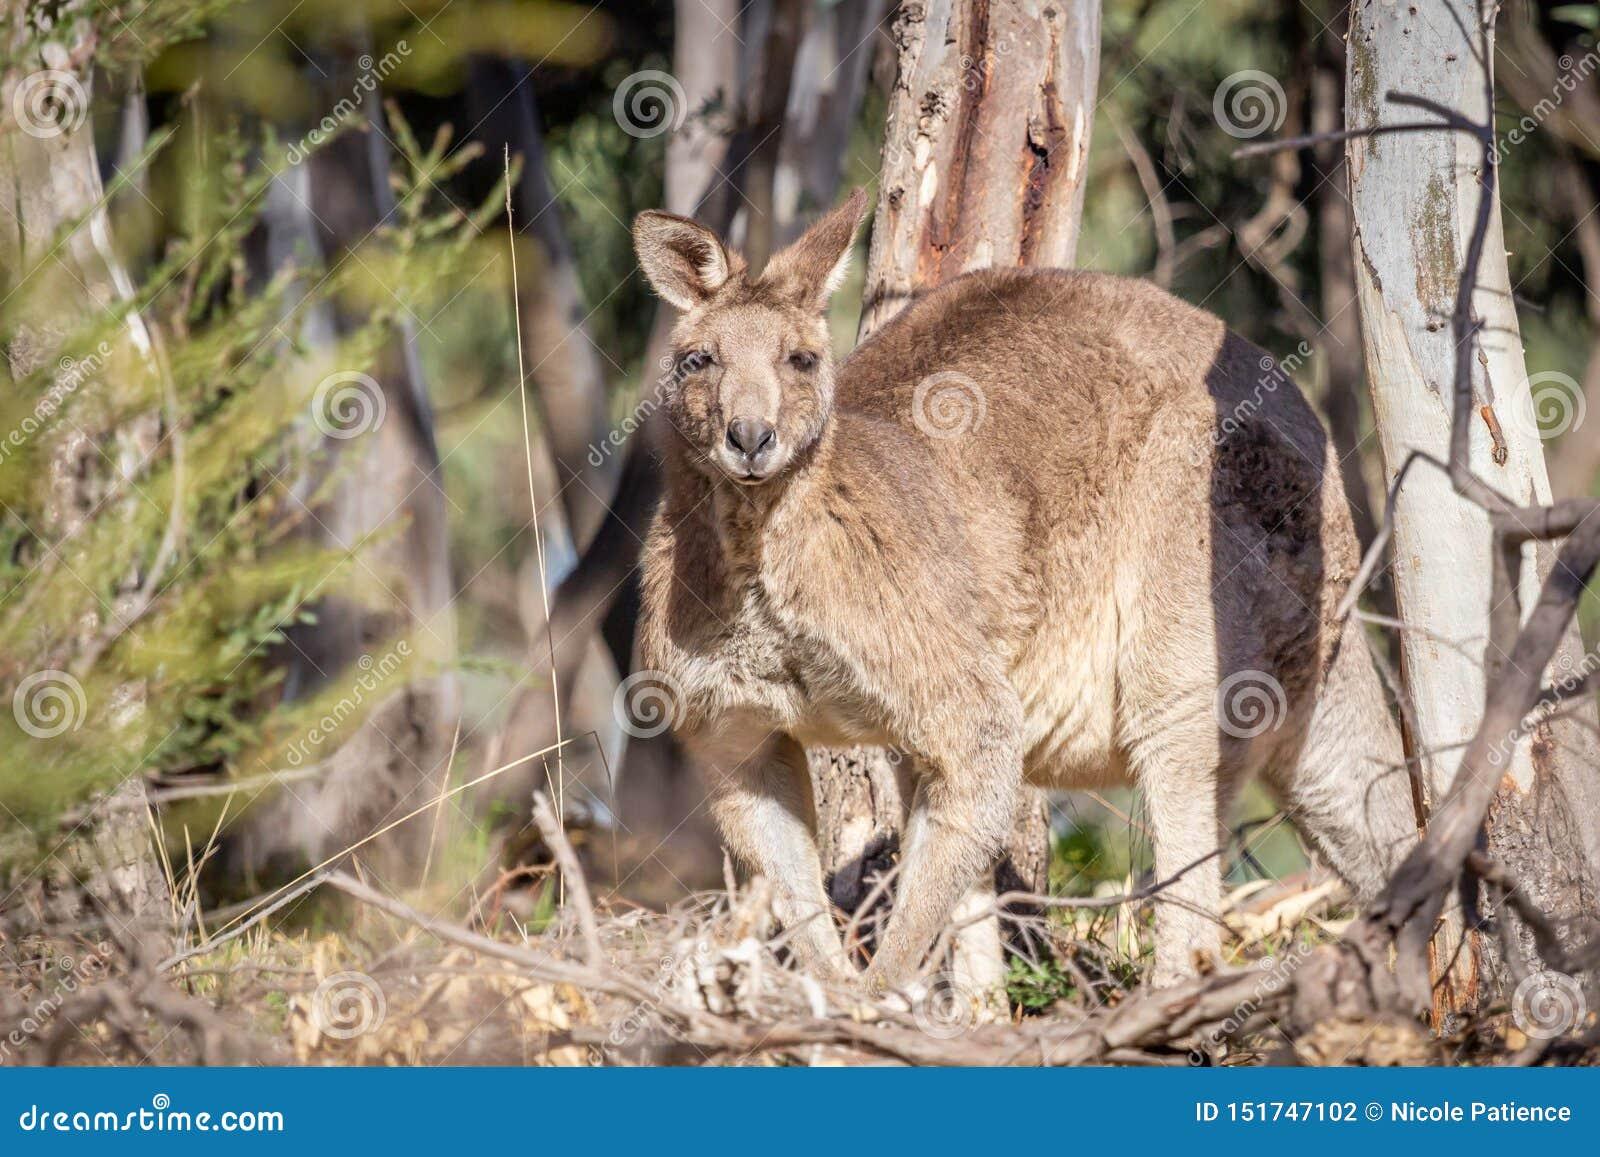 Grey Kangaroo orientale maschio selvaggio, parco storico dei terreni boscosi, Victoria, Australia, giugno 2019